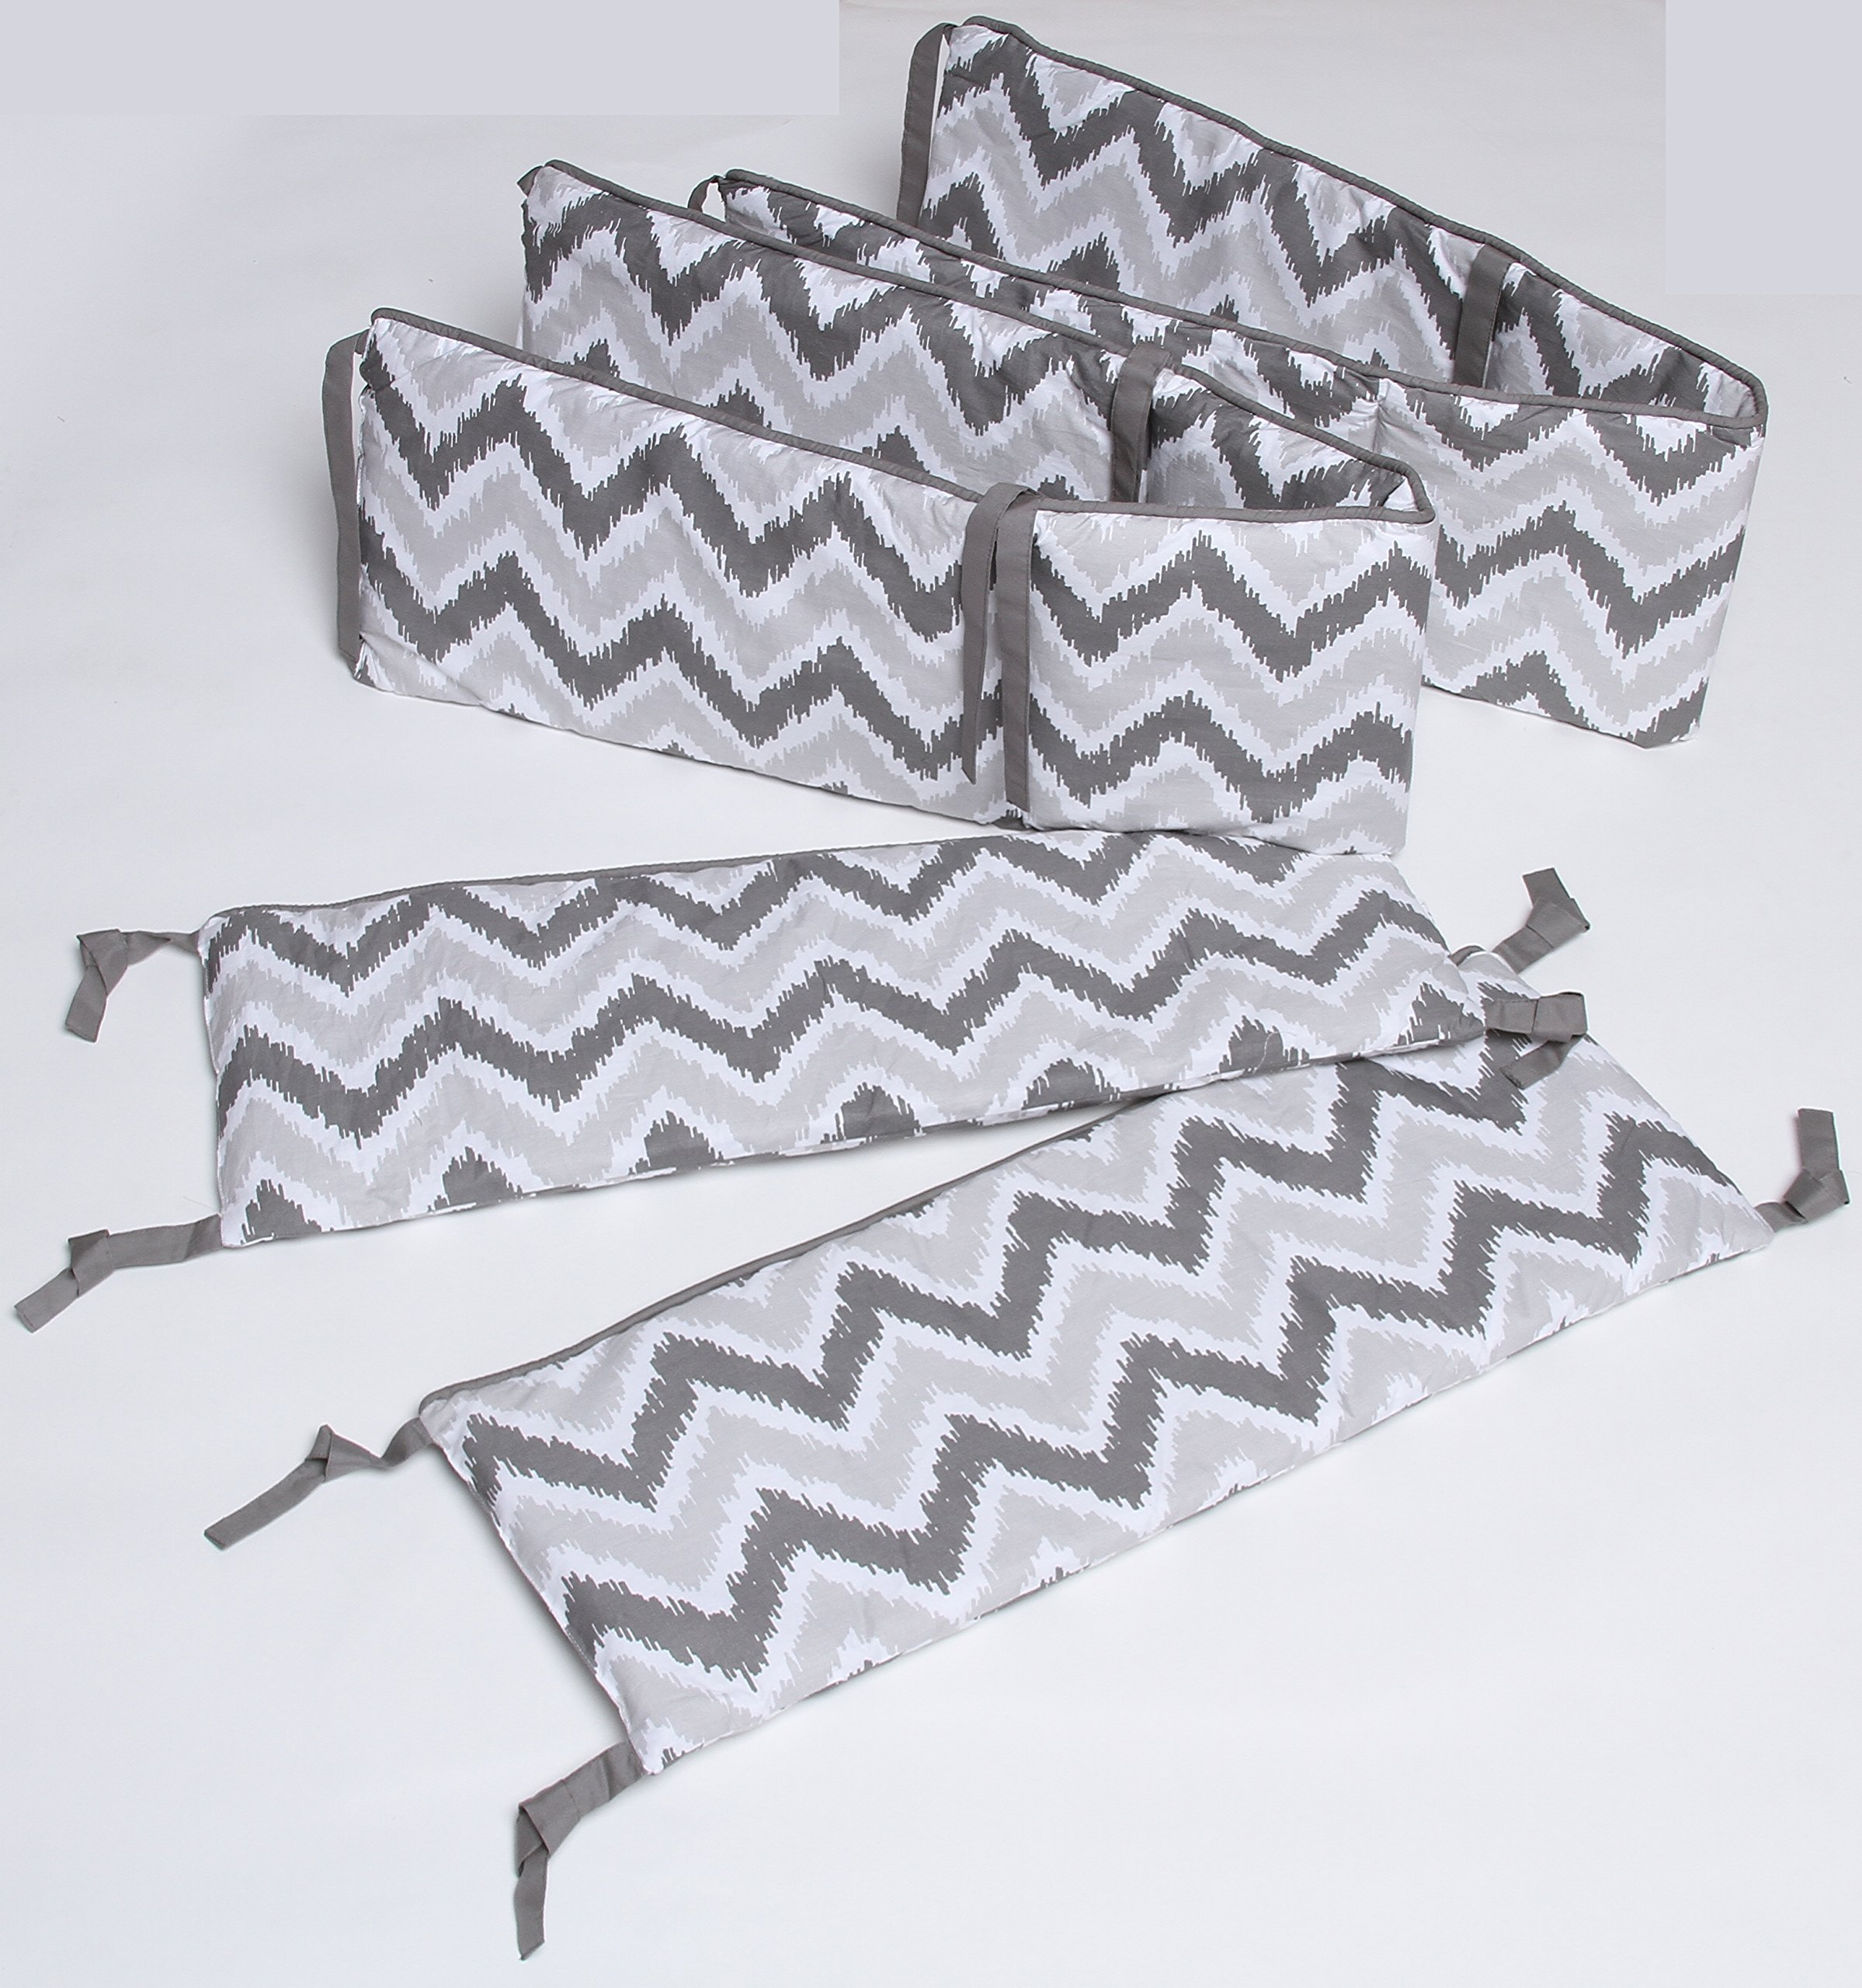 Bacati Ikat Chevron 10 Piece Crib Set with Bumper Pad, Coral/Grey by Bacati (Image #2)